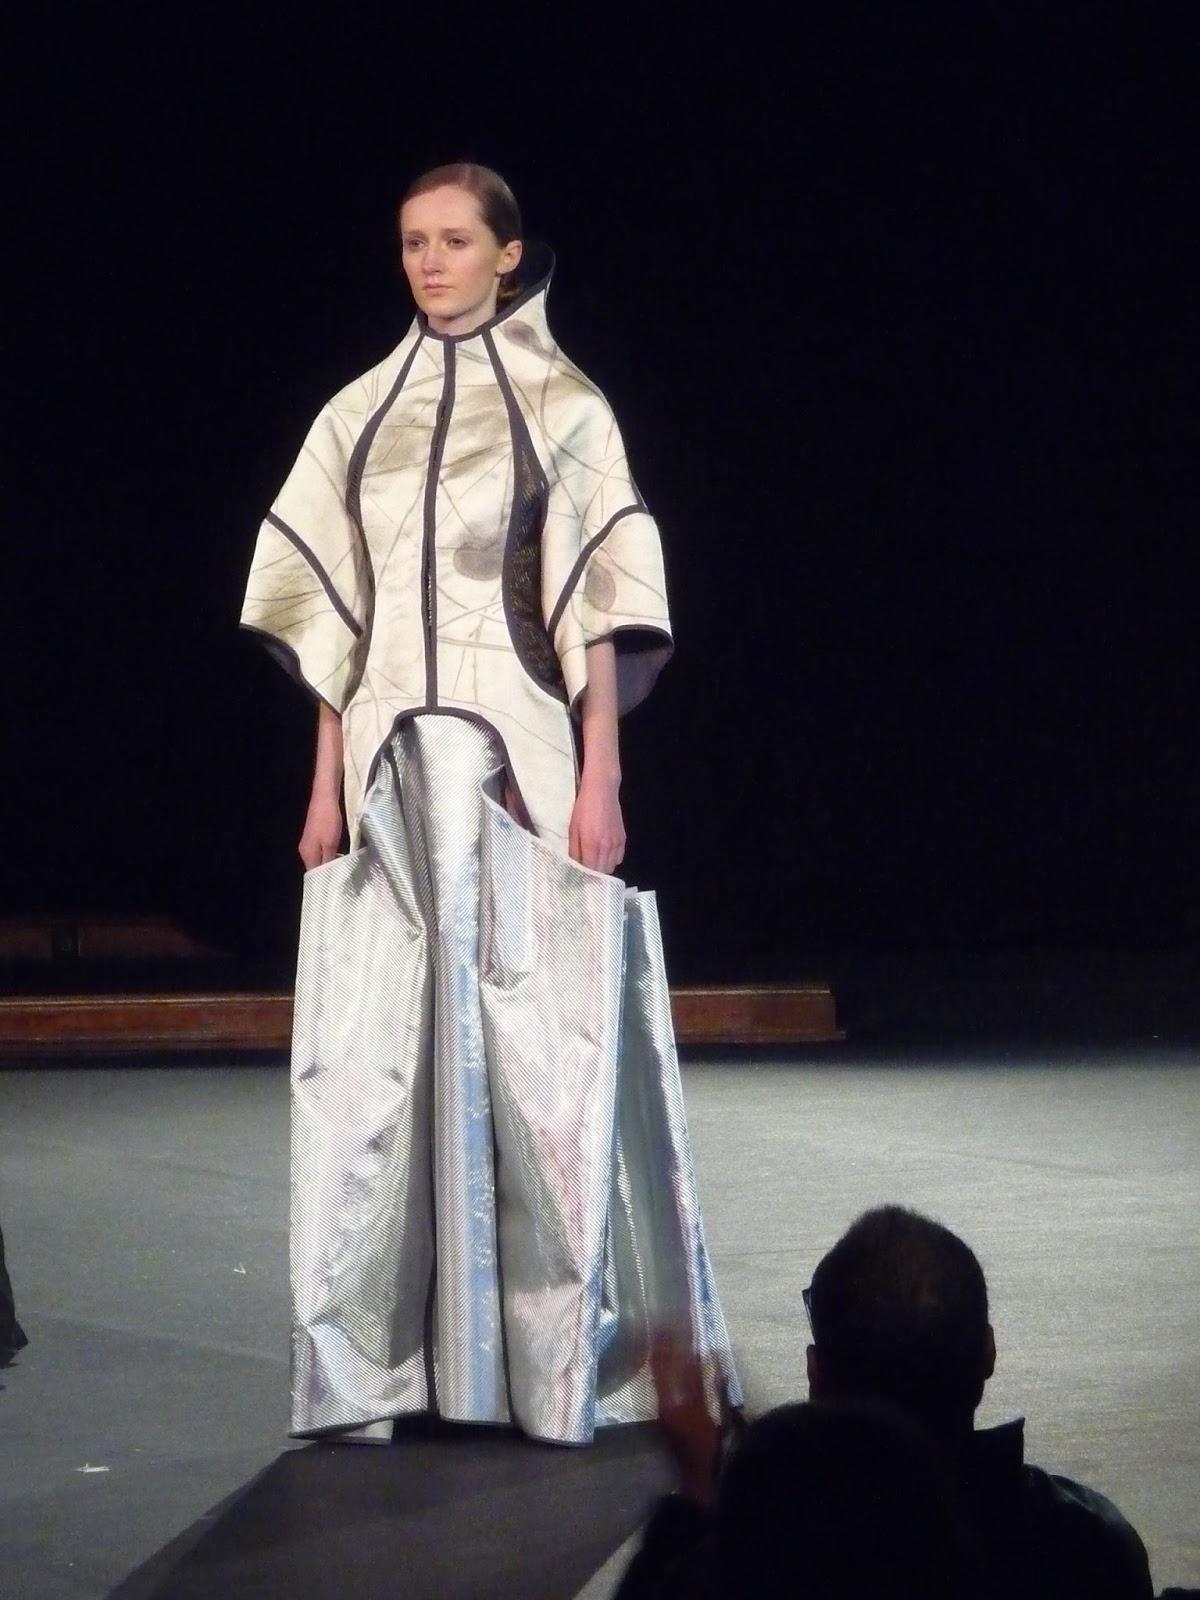 Edinburgh college of art fashion show tickets Events in Edinburgh Today What's On Edinburgh